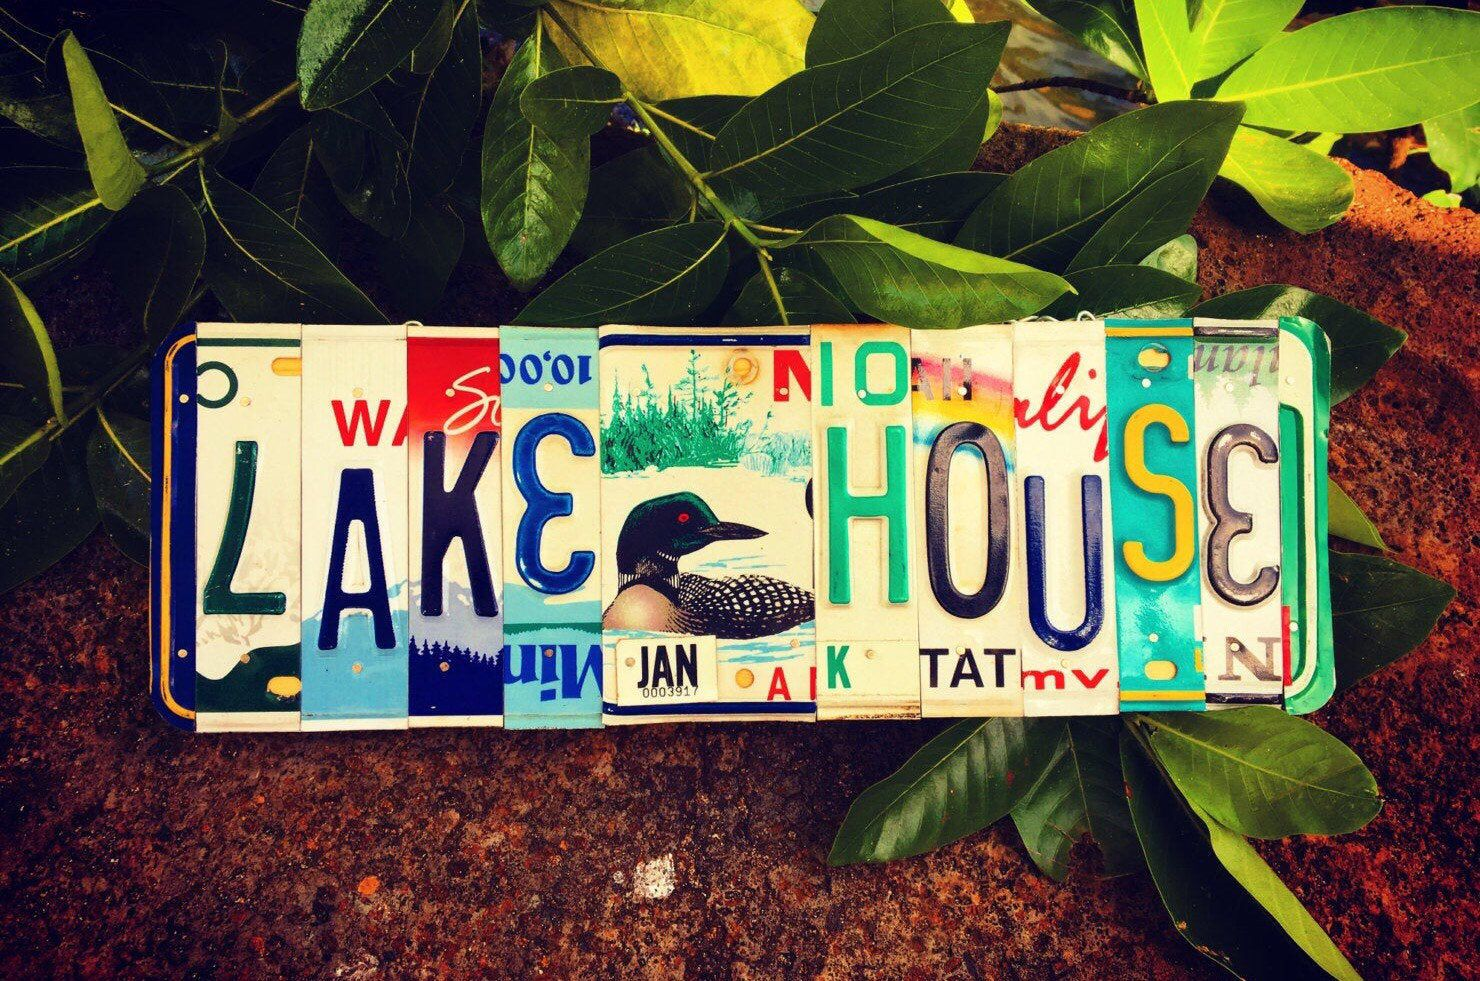 The Lake House ⚓️ #lakehouse #etsy #lakelife #lake #cabin #vacation #michigan #homedecor #lakeview #lakefront #decor #lakeside #lakeliving #lakehome #cabinlife #lakes